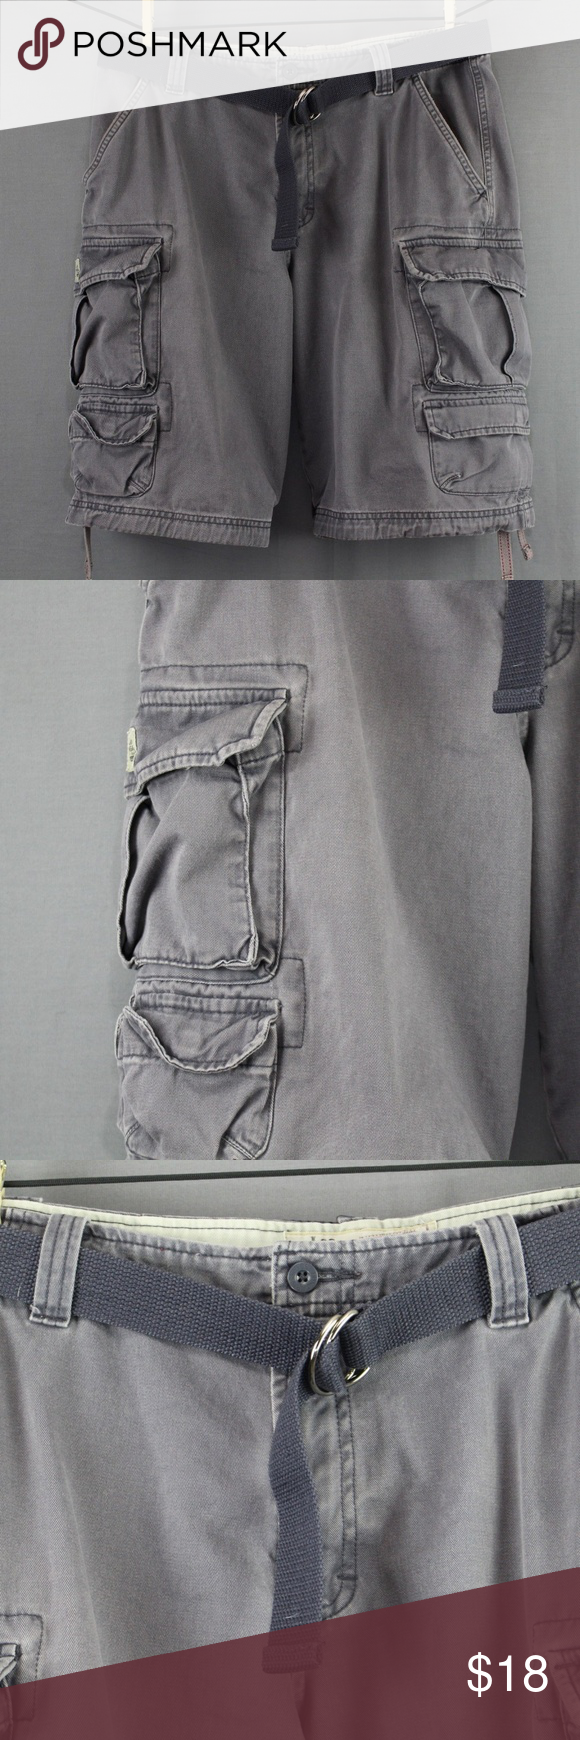 b1b593d7ba Lee Dungarees Cargo Shorts Size 32 Gray Mens Lee Dungarees Cargo Shorts  Size 32 Gray Mens